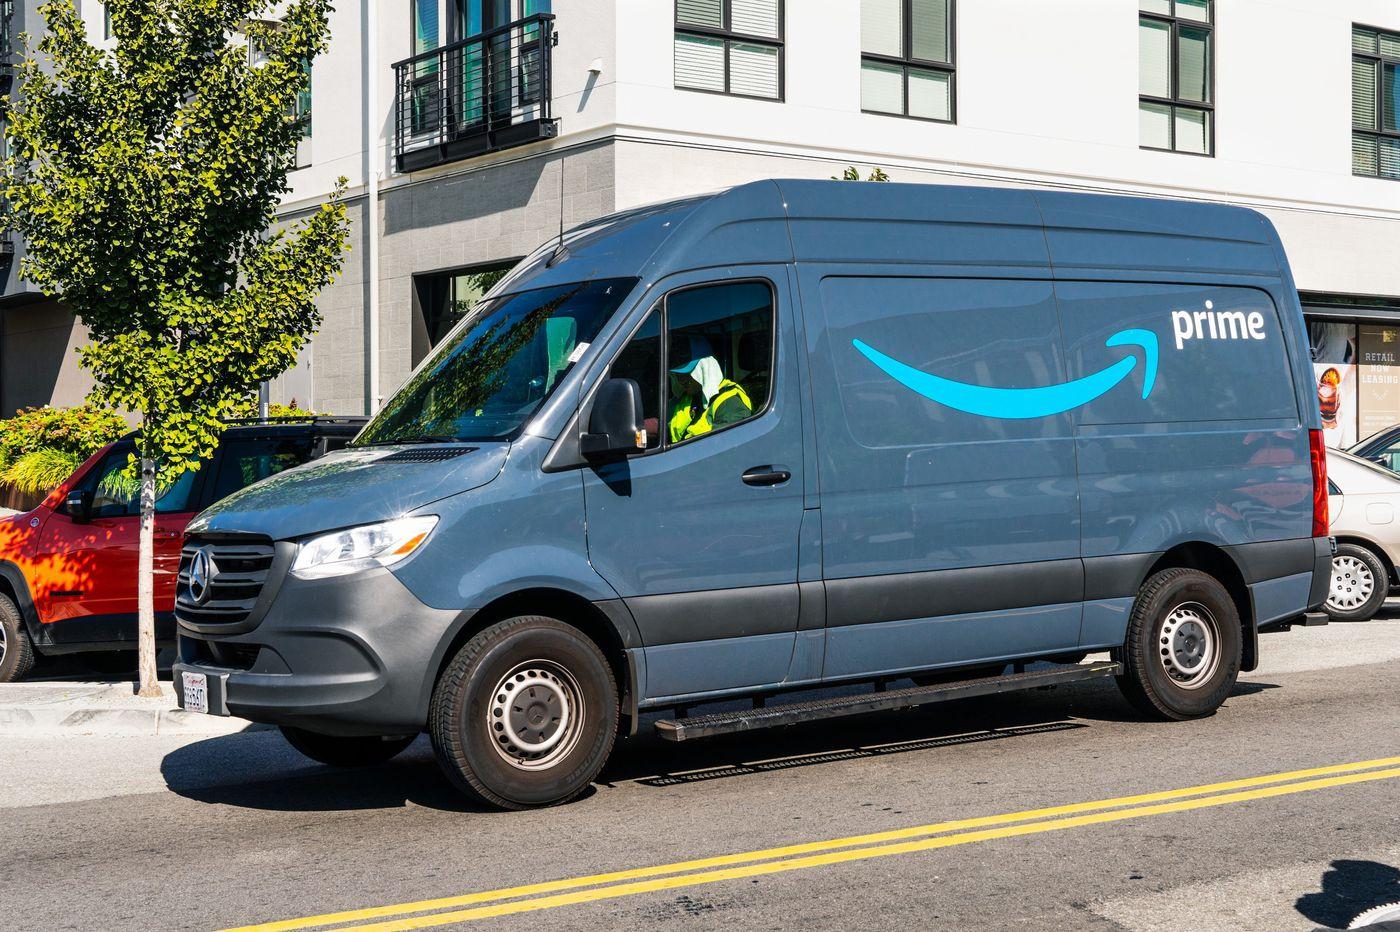 Prime members first: Amazon is ranking customers and ramping up hiring to address coronavirus demand